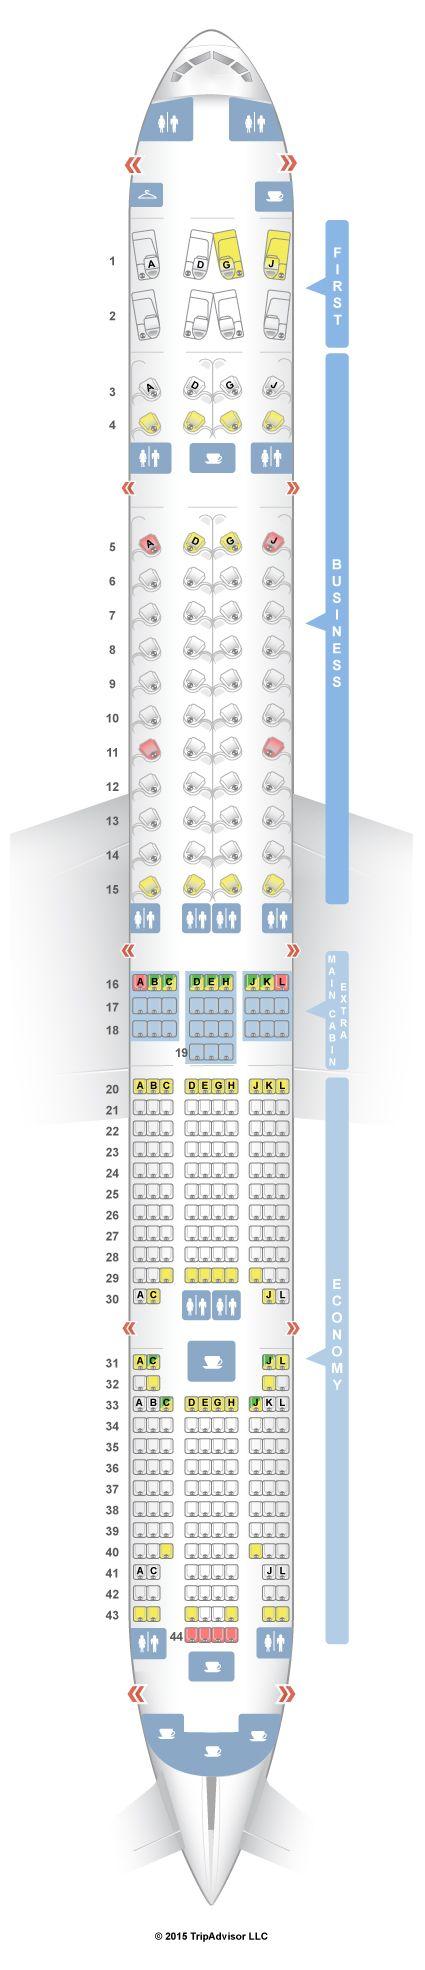 SeatGuru Seat Map American Airlines Boeing 777-300ER (77W)